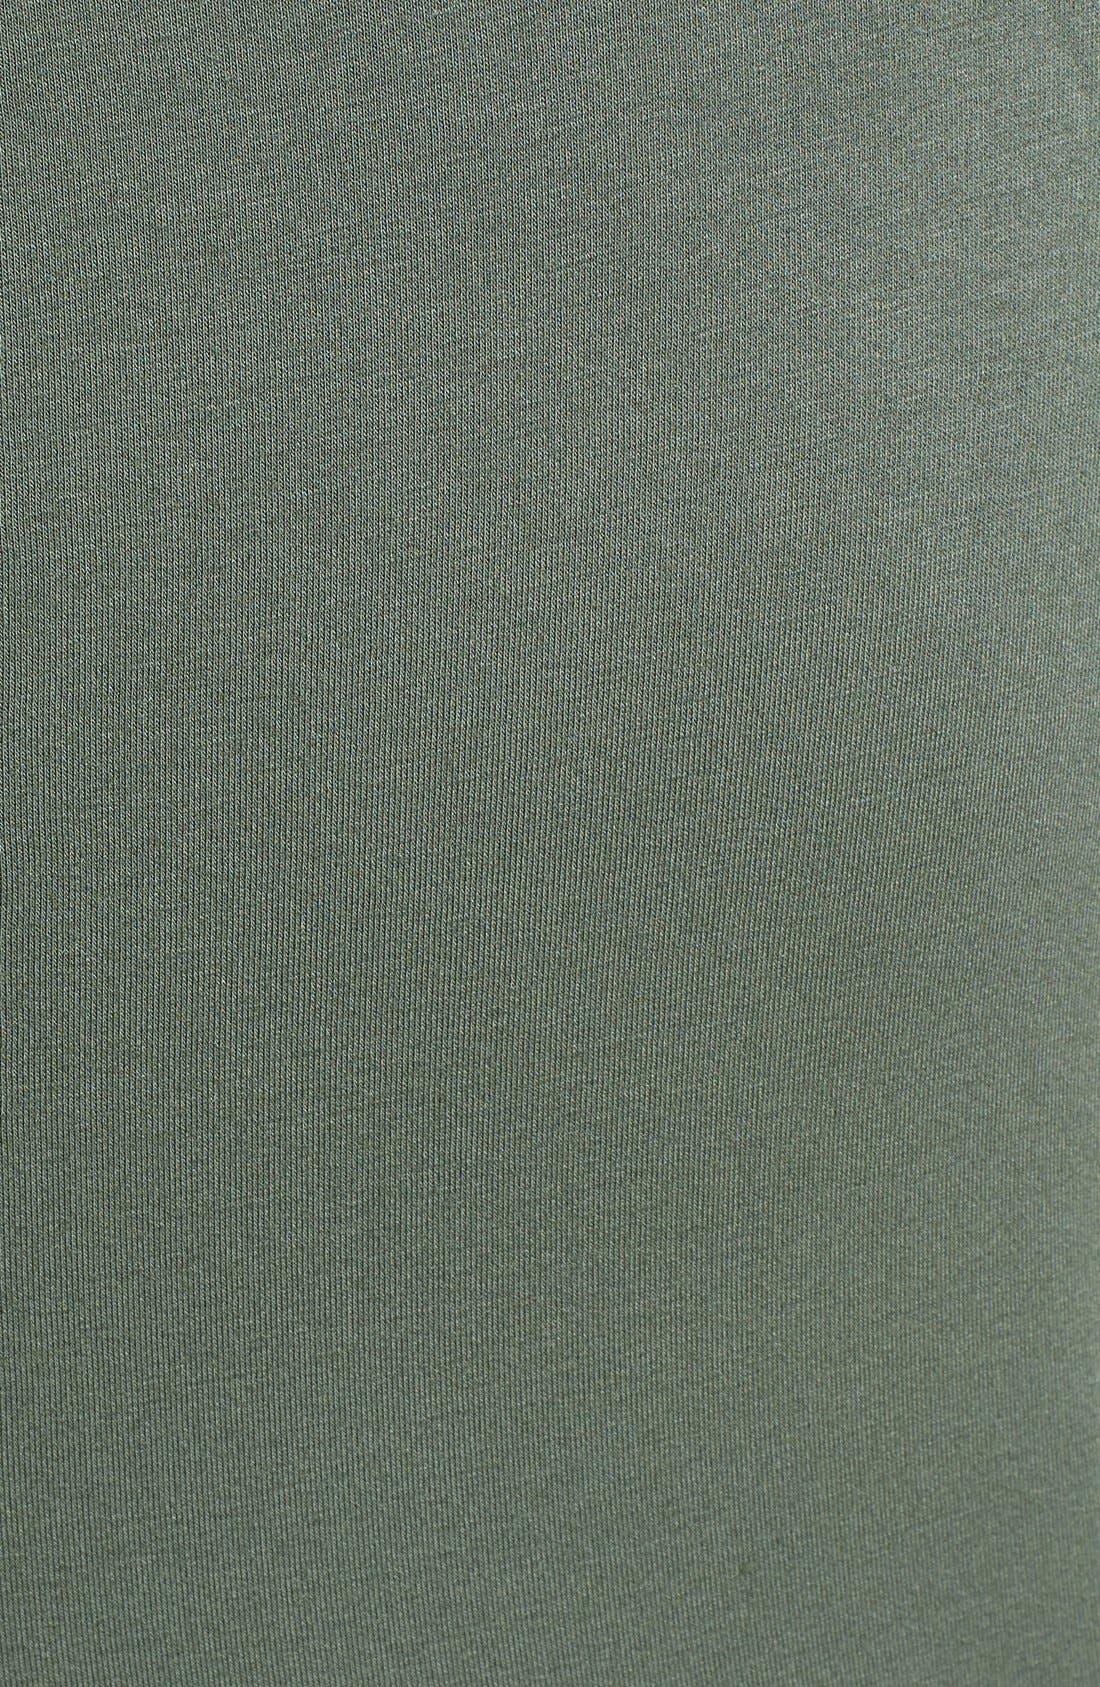 Alternate Image 3  - Donna Karan Collection Twist Draped Tank